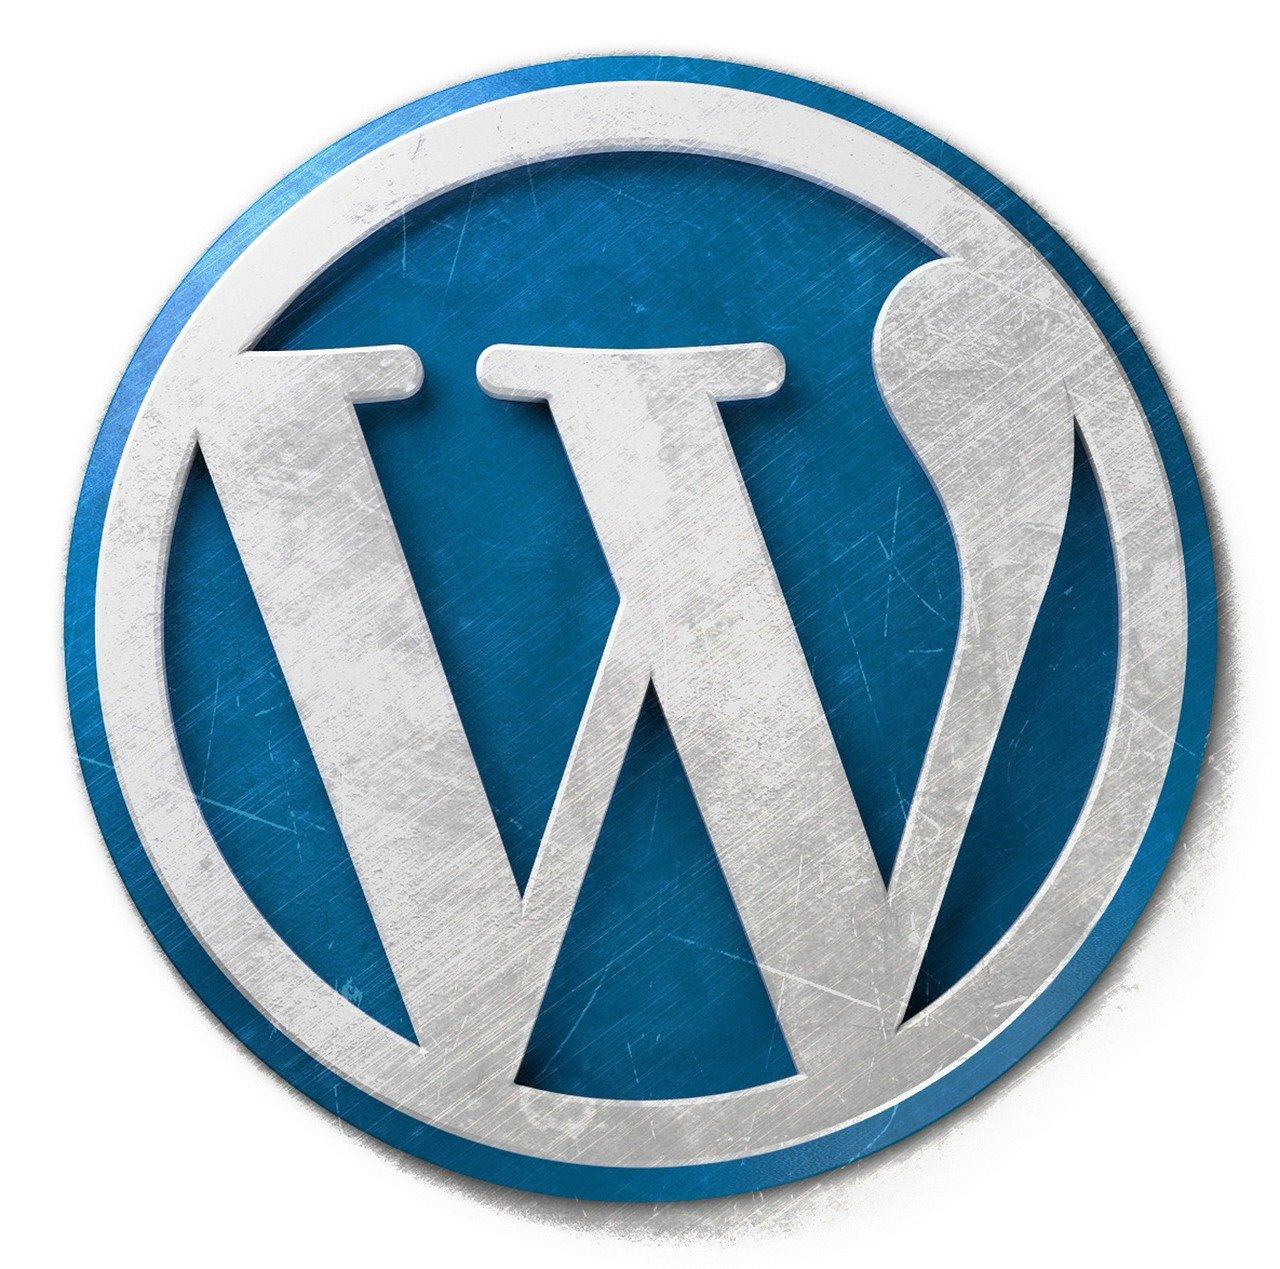 Création d'un site Internet Gardanne avec WordPress